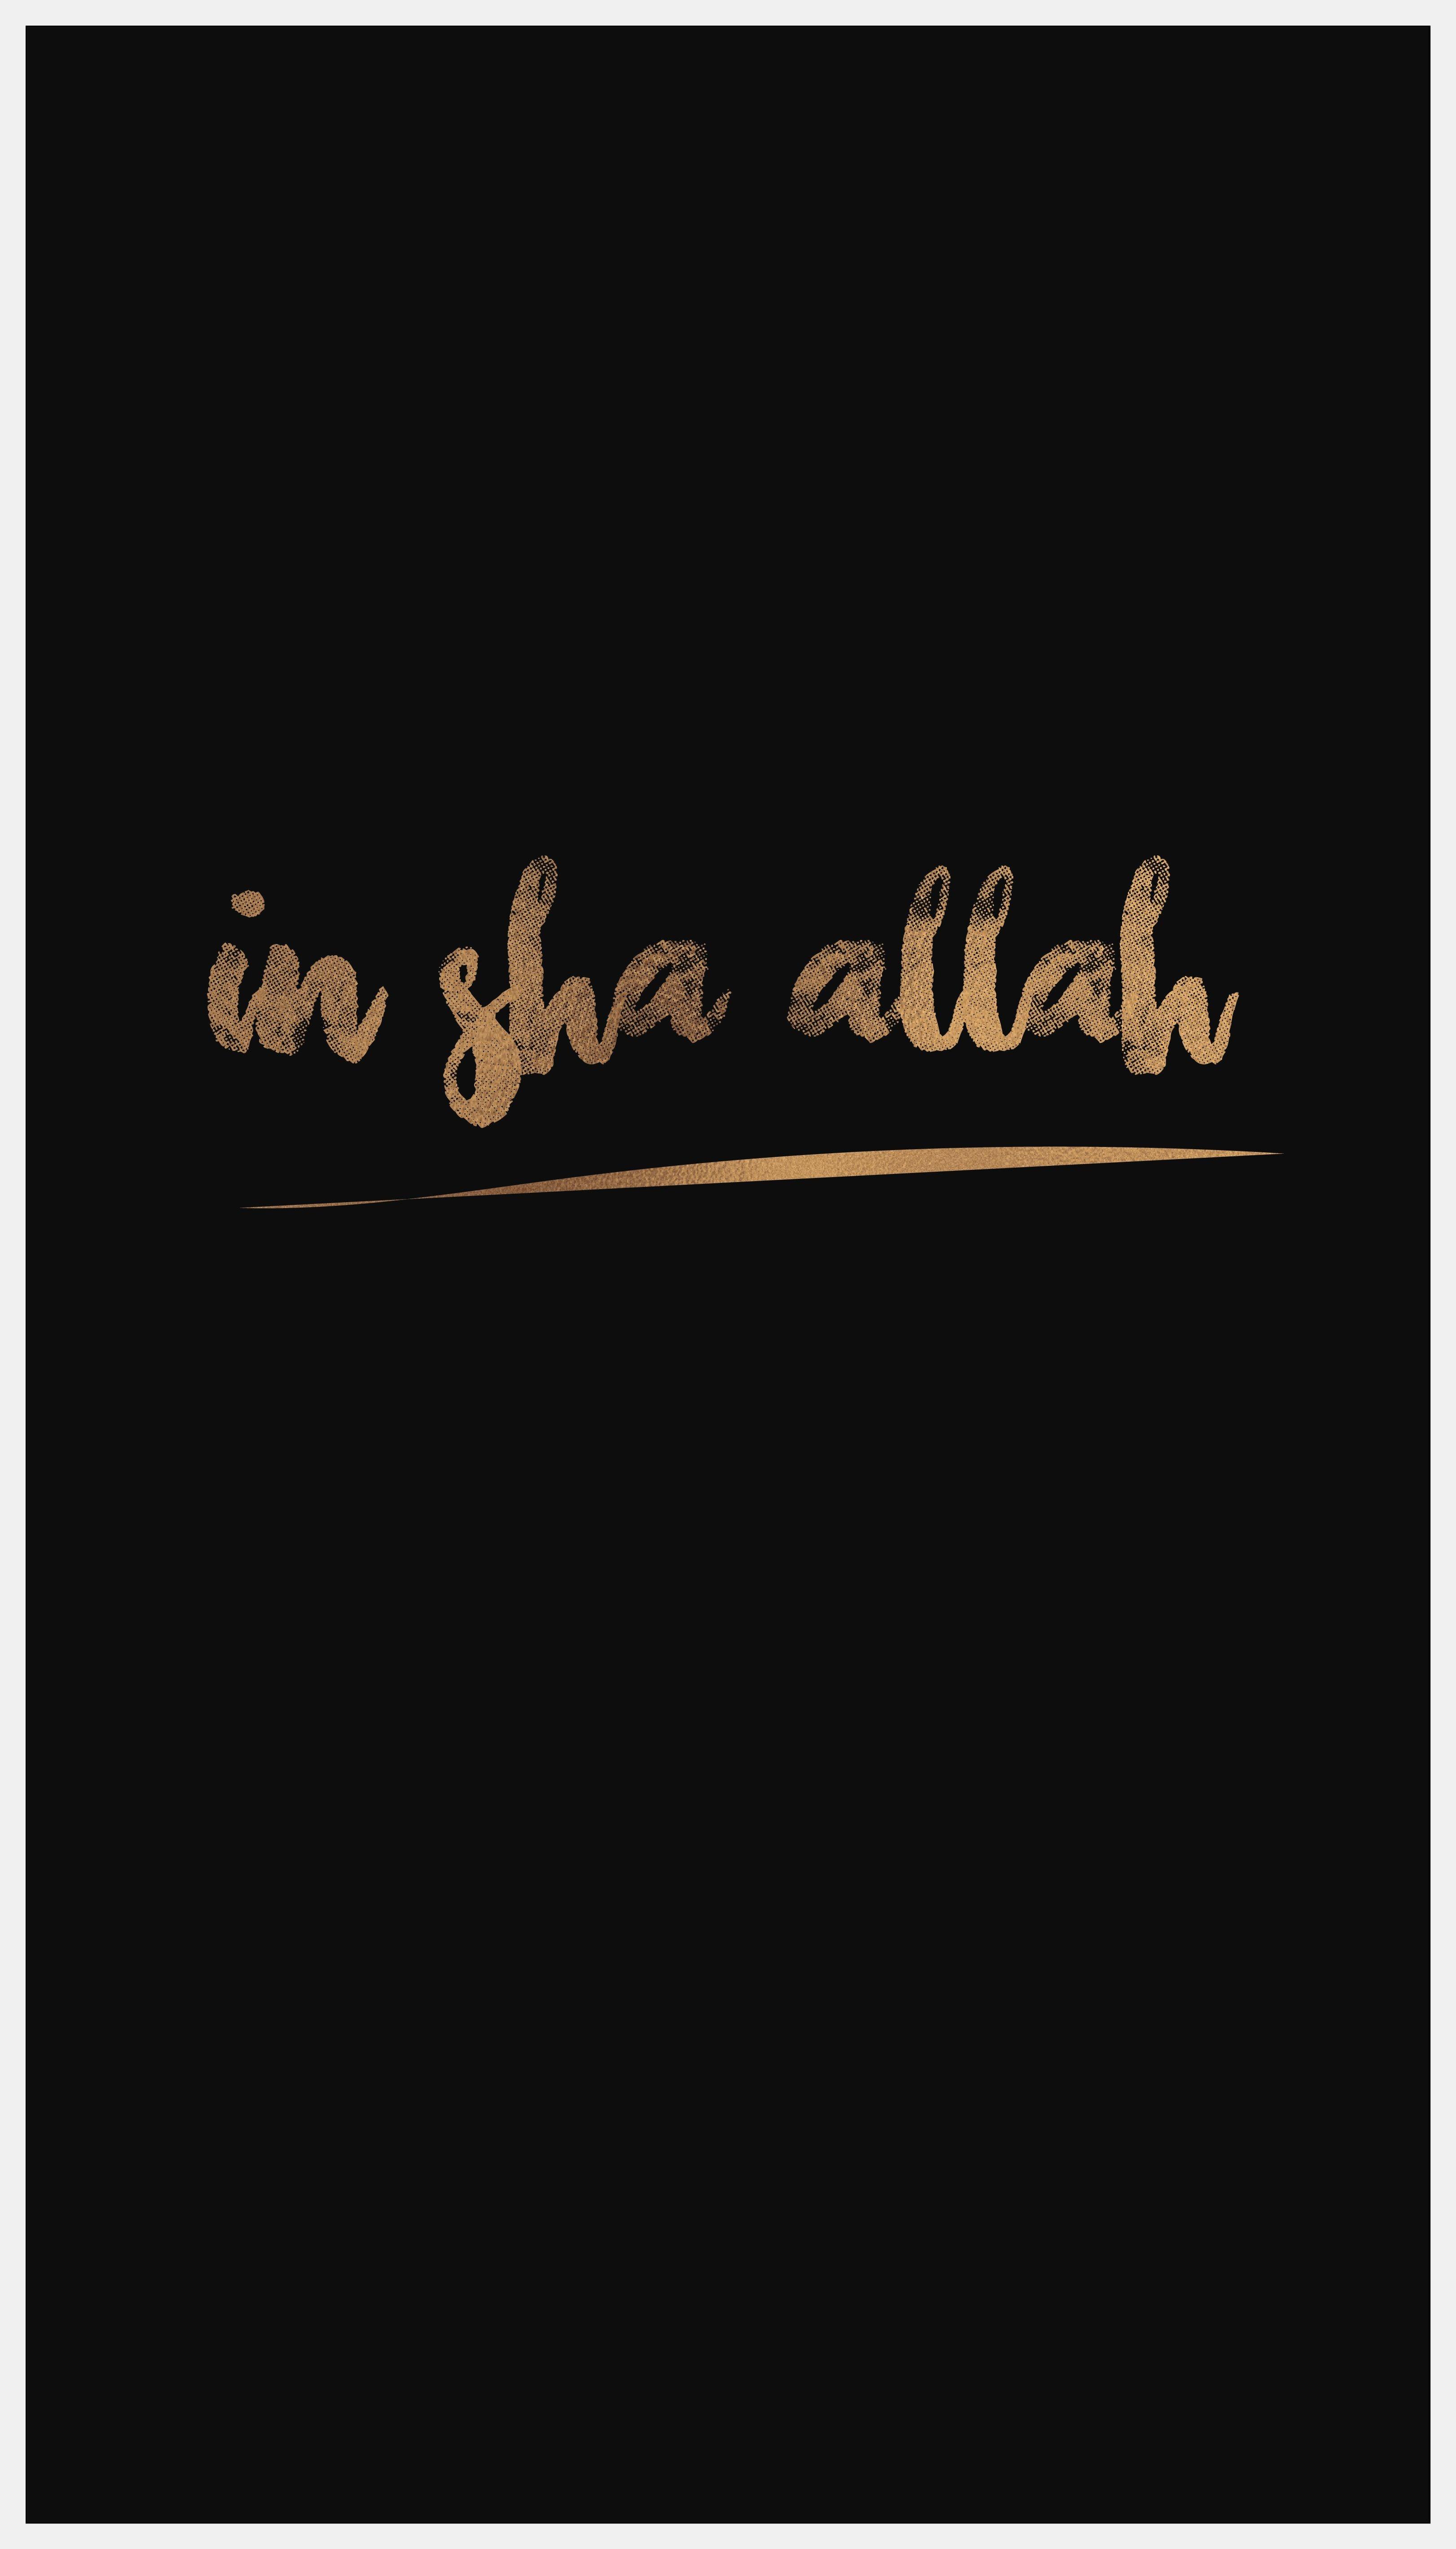 Spiksplinternieuw Wallpaper Islamic posted by Christopher Tremblay CK-37